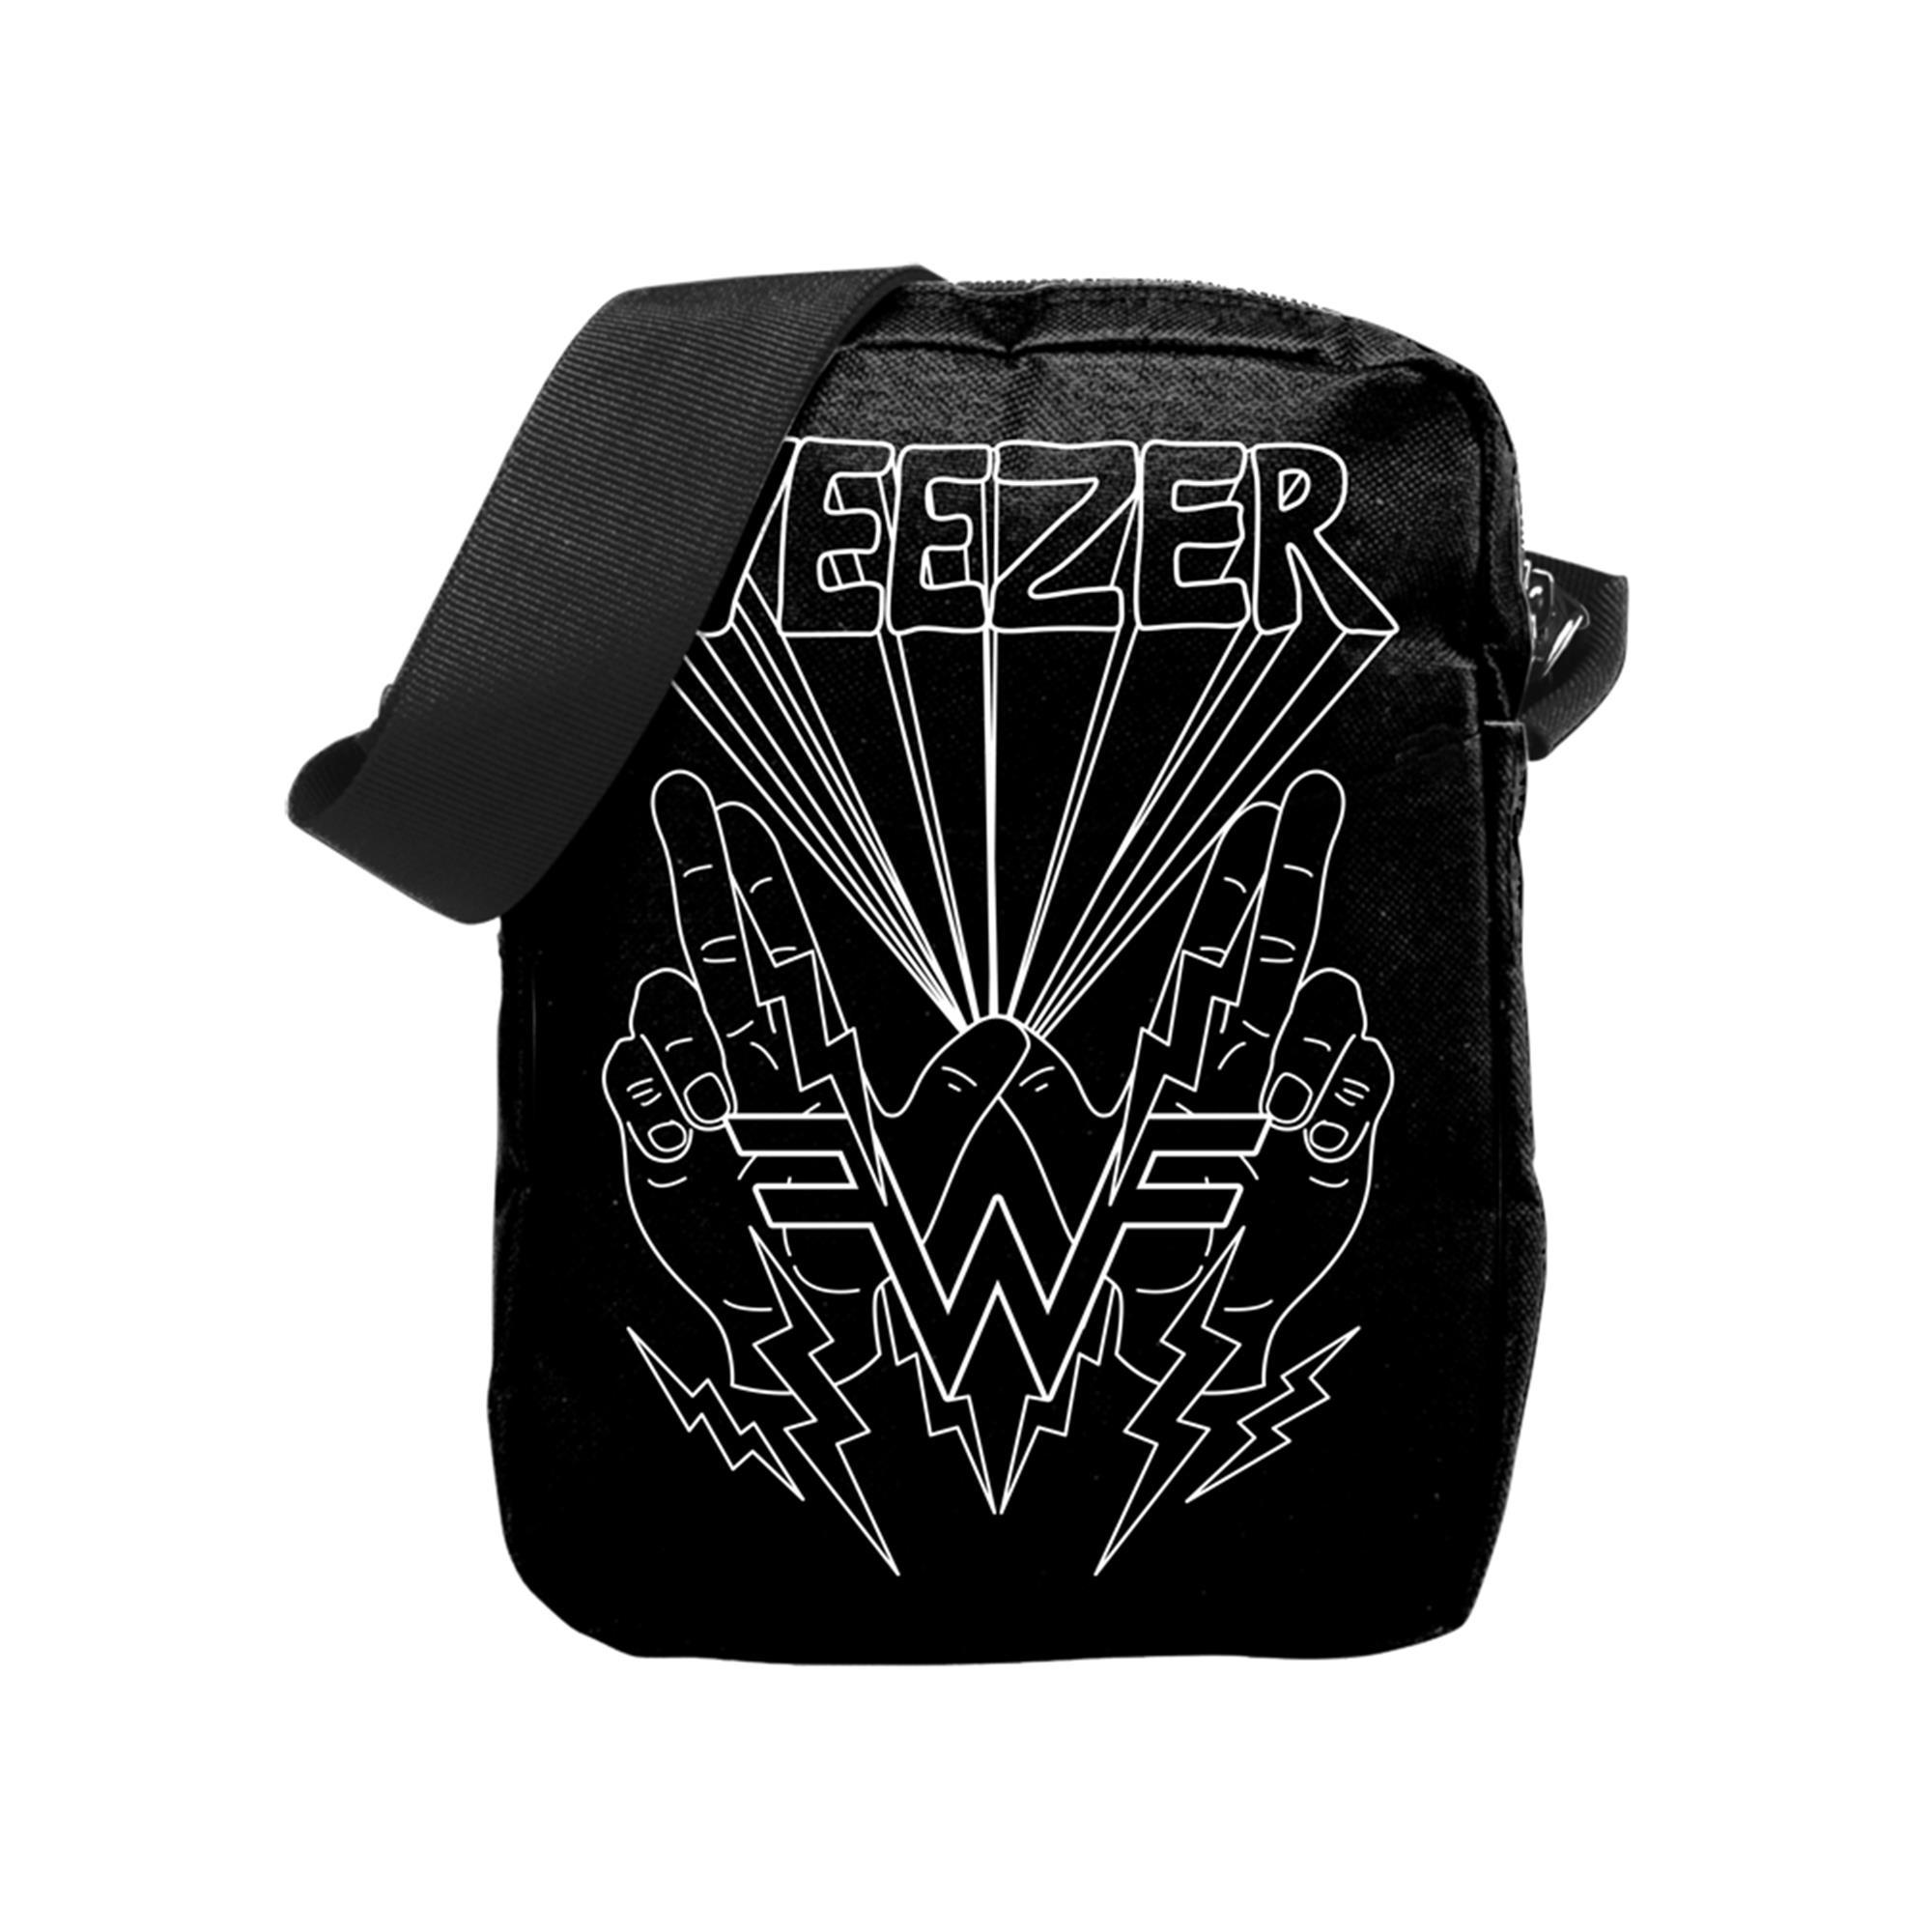 Weezer Only in Dreams Crossbody Bag